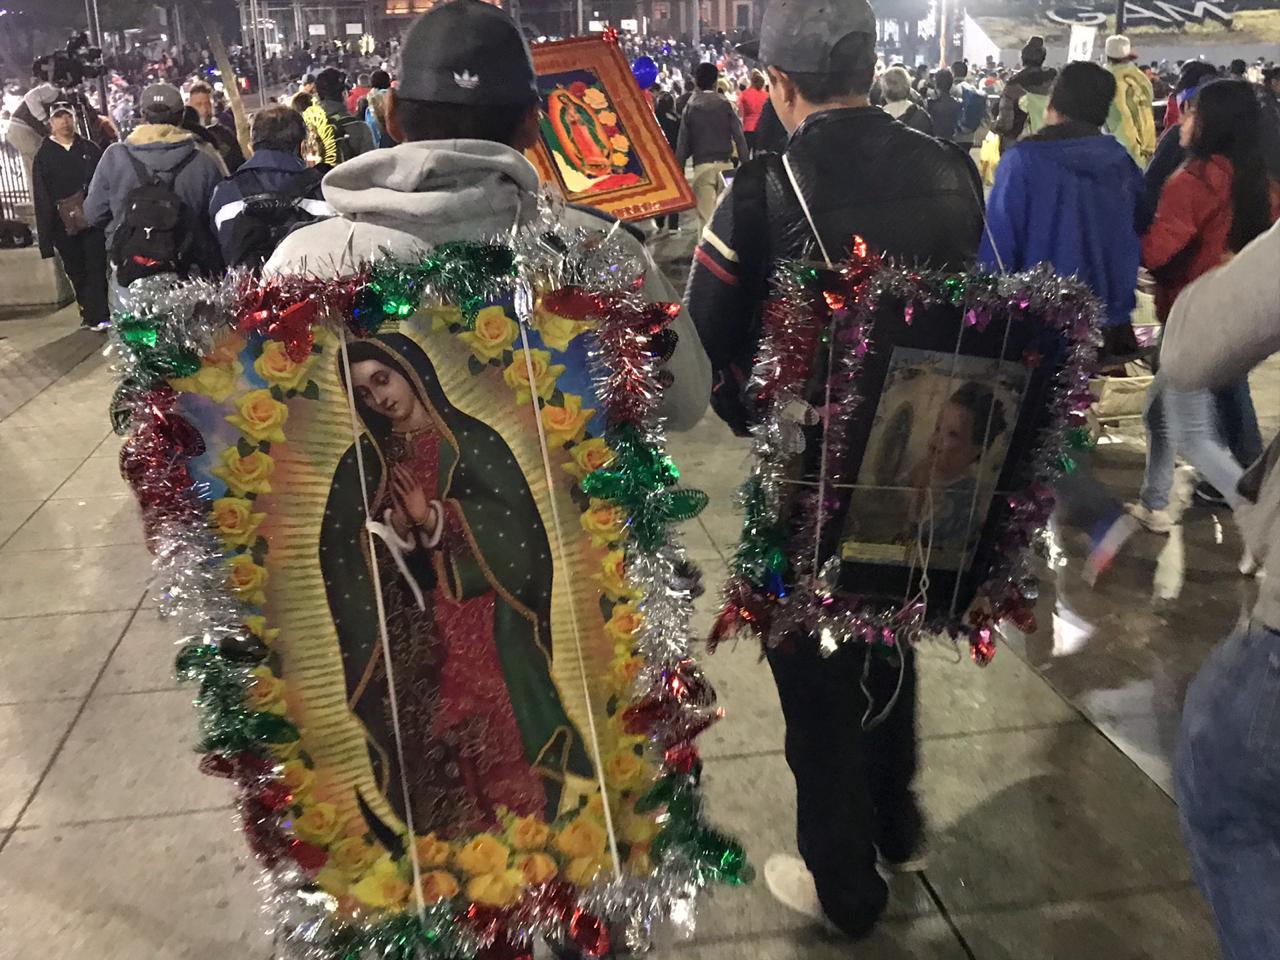 Basílica de Guadalupe, Virgen de Guadalupe, peregrinos, fieles católicos,